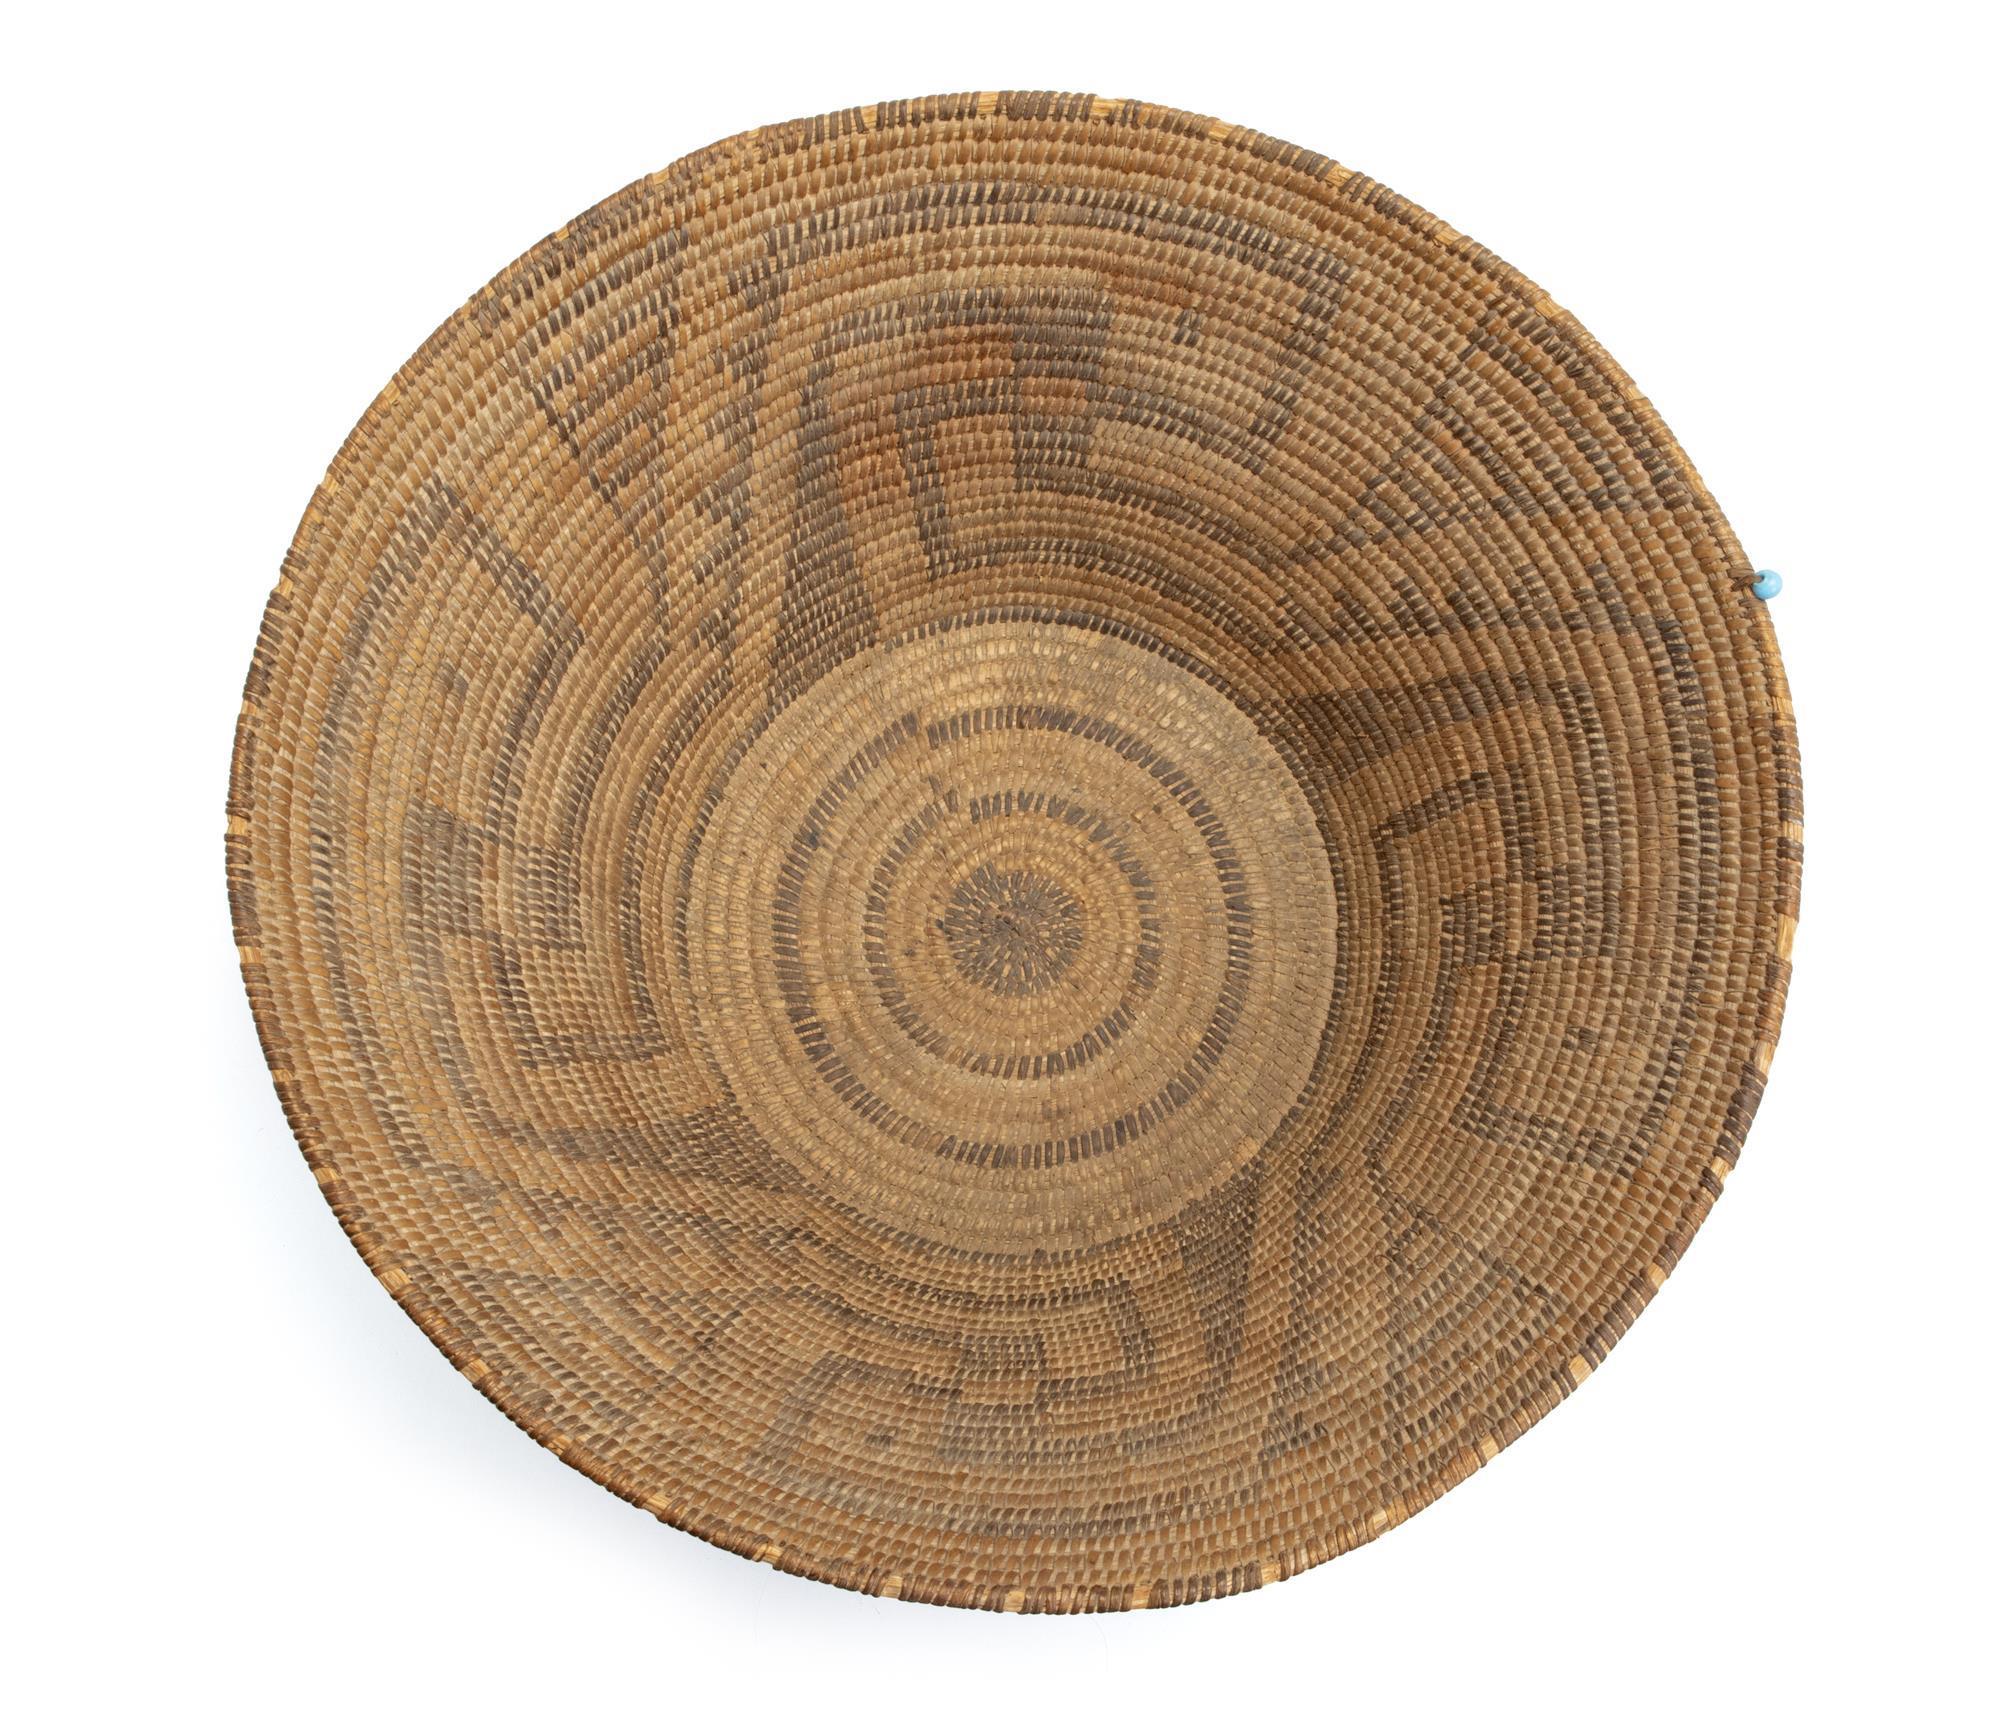 A large Pima basket